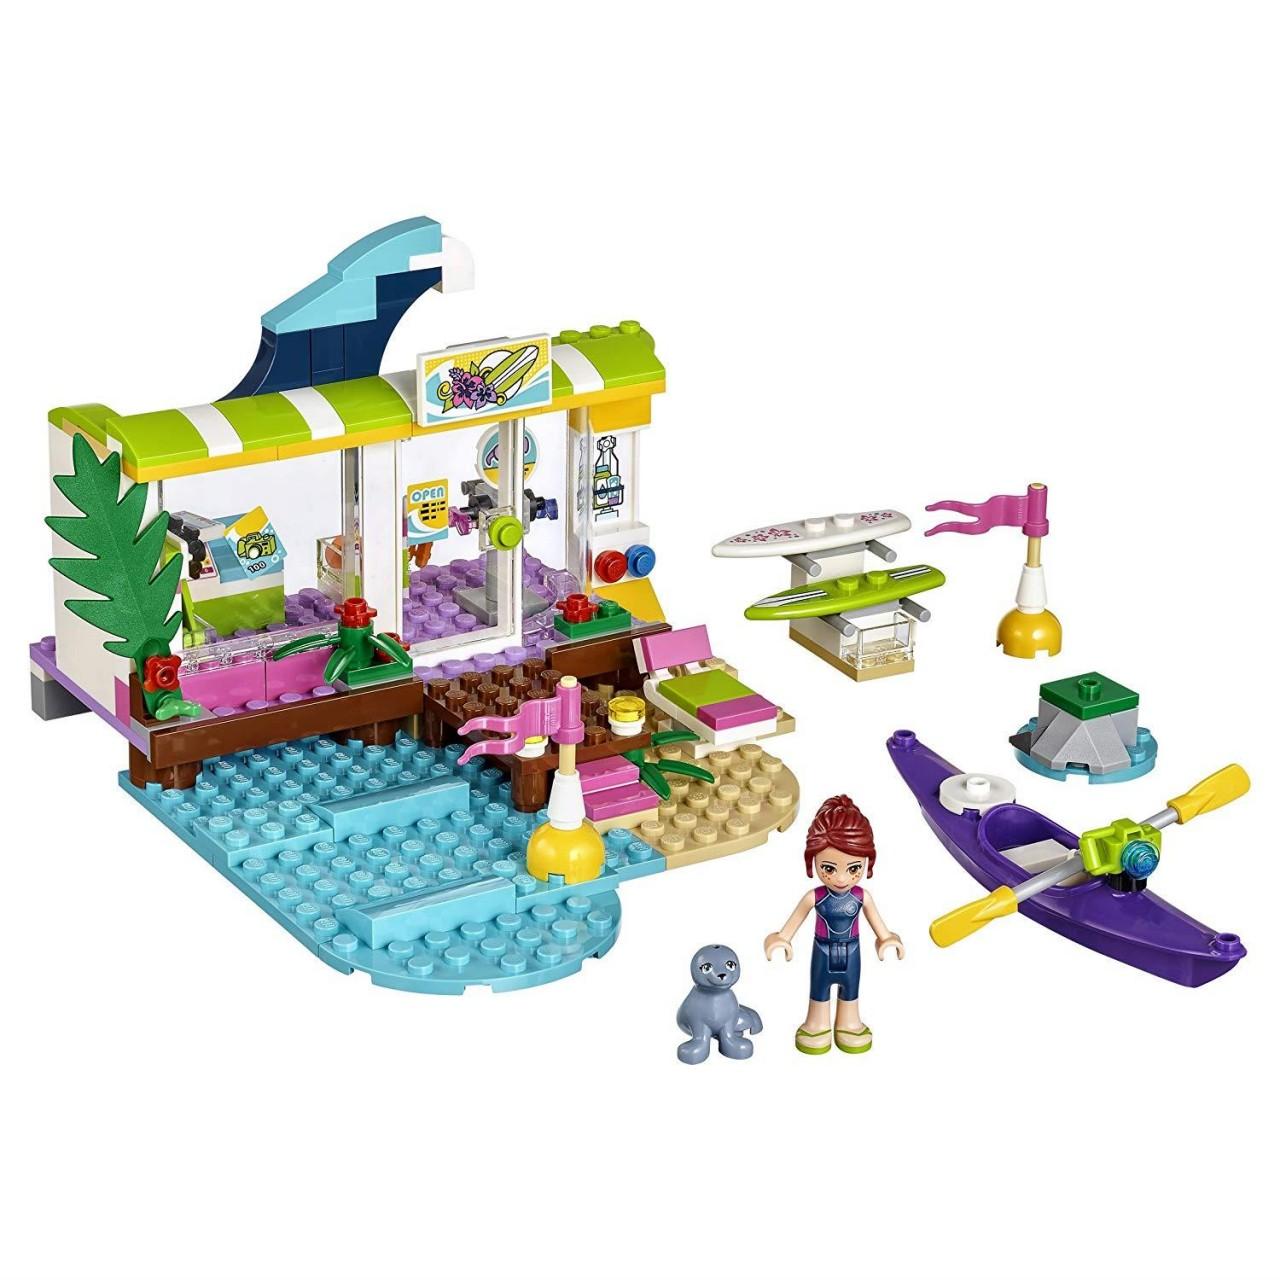 LEGO FRIENDS 41315 Heartlake Surfladen